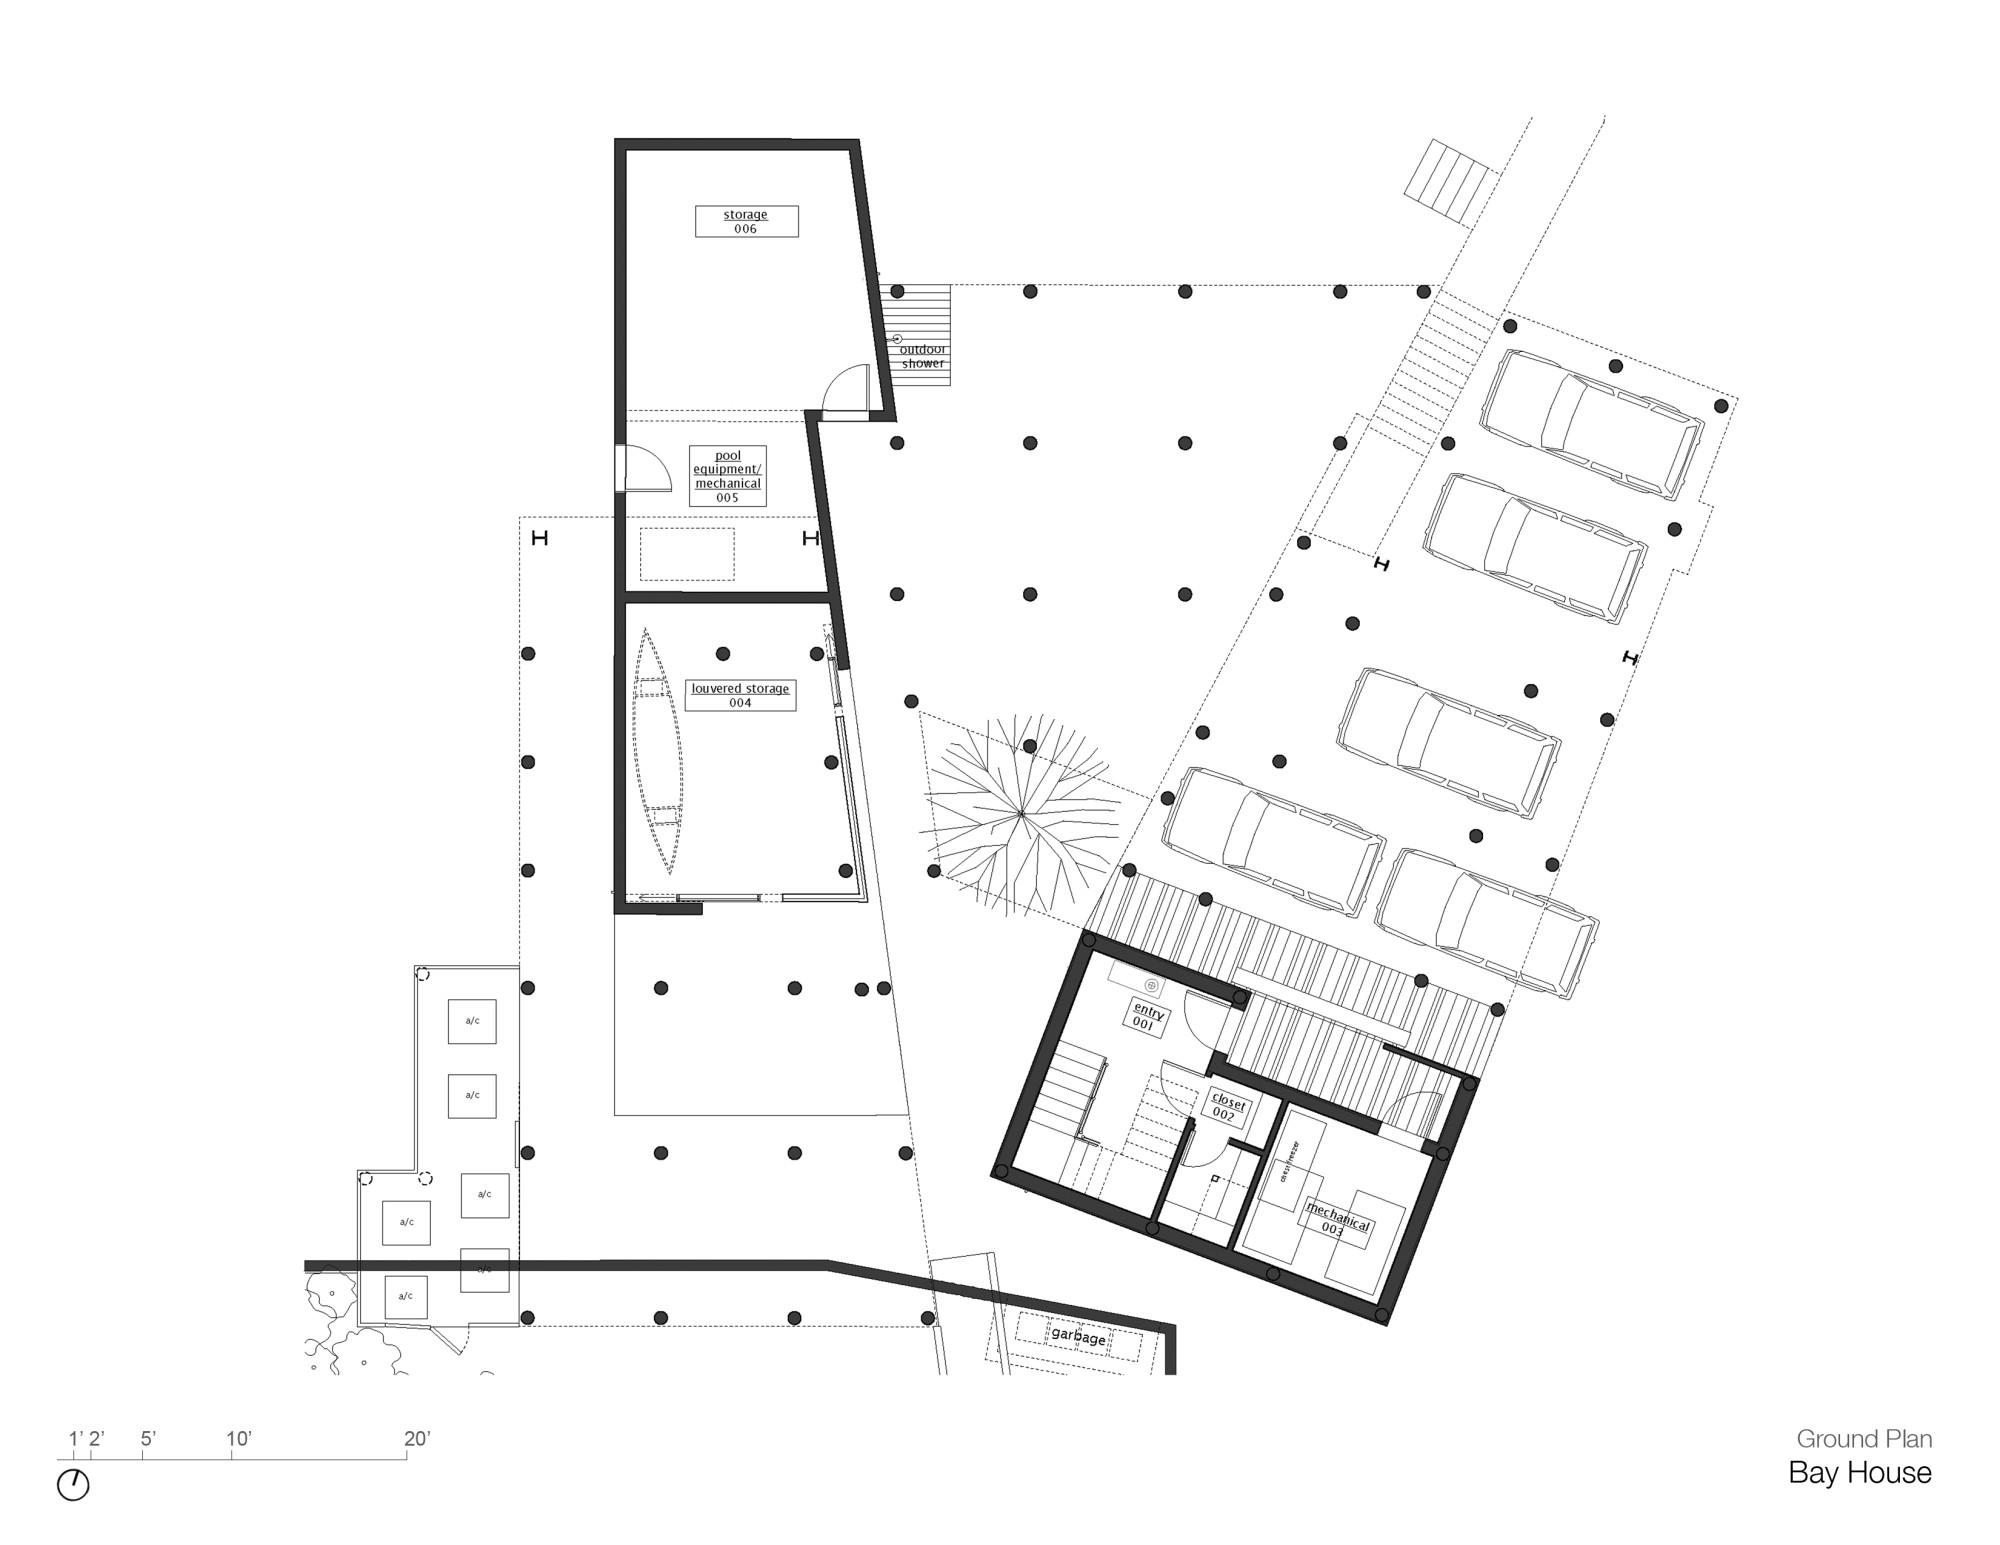 Ground Floor Plan, Bay House in Westhampton Beach, New York